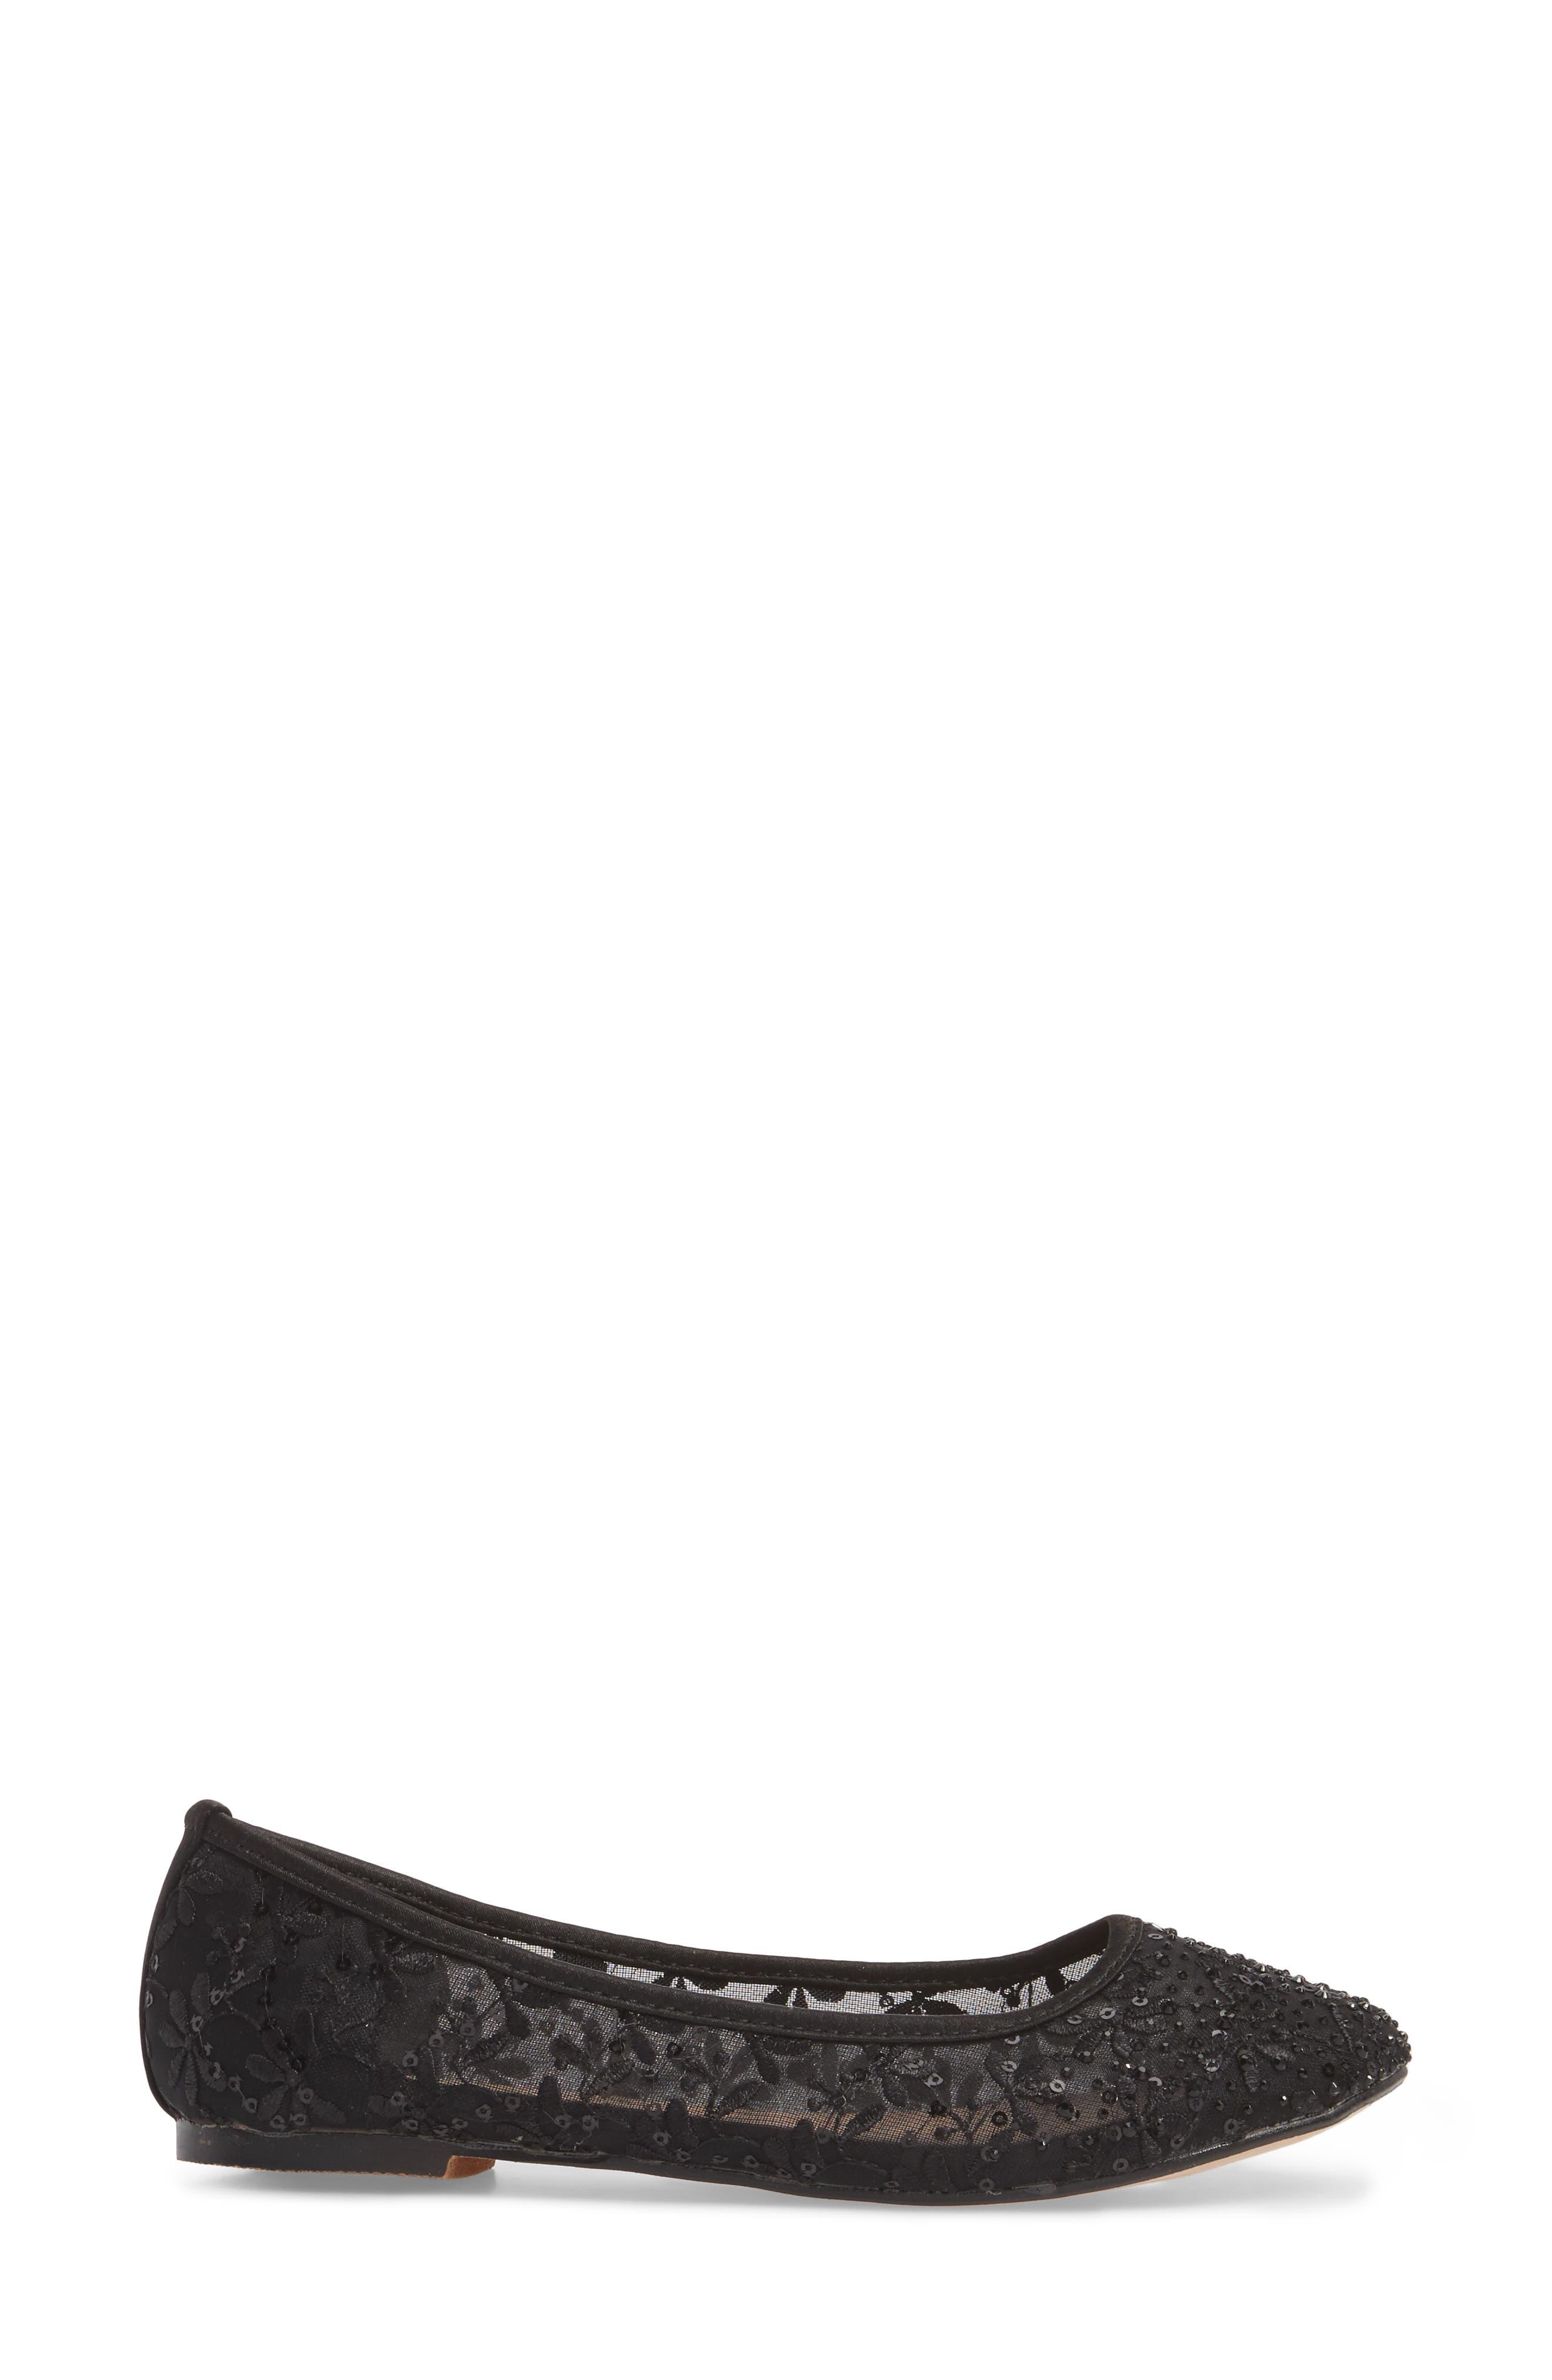 Betsy Embellished Flat,                             Alternate thumbnail 3, color,                             Black Fabric